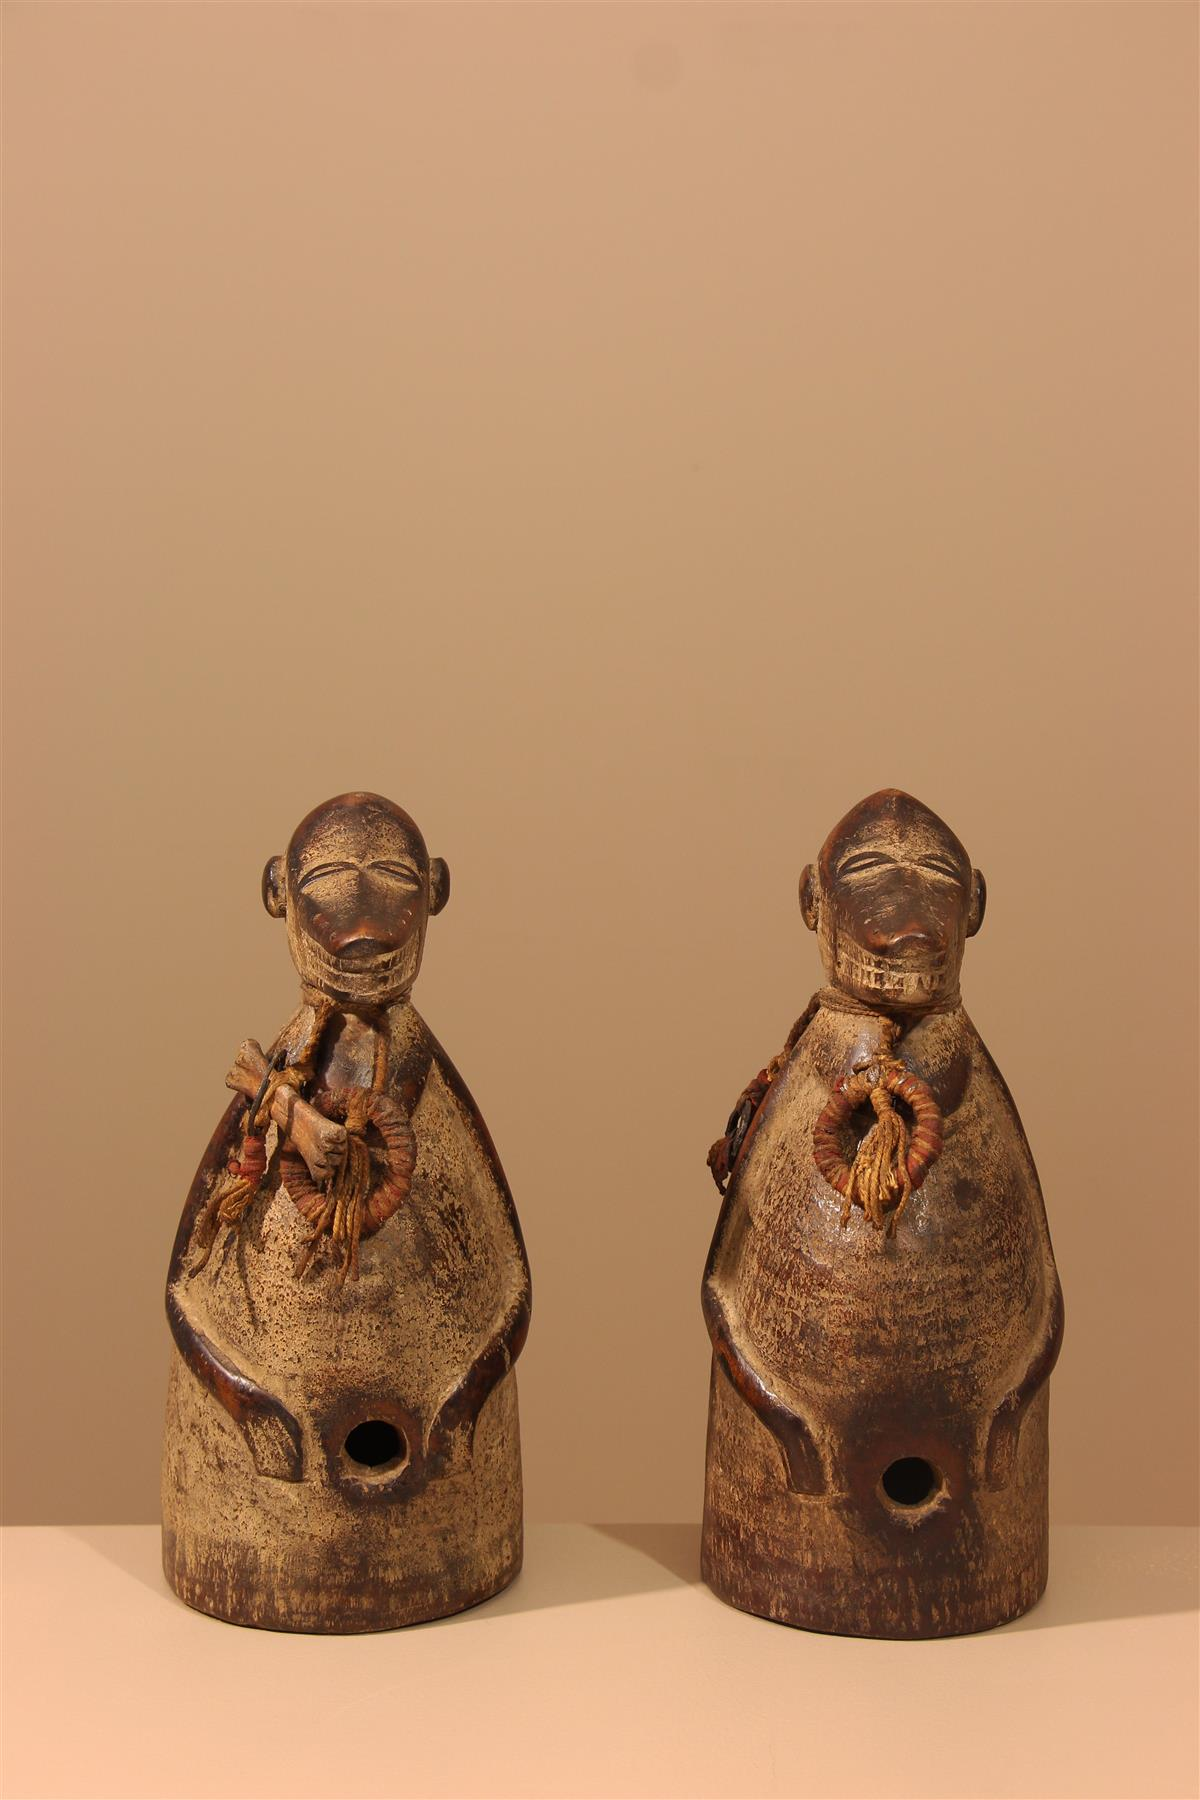 Statuettes Baule - Déco africaine - Art africain traditionnel